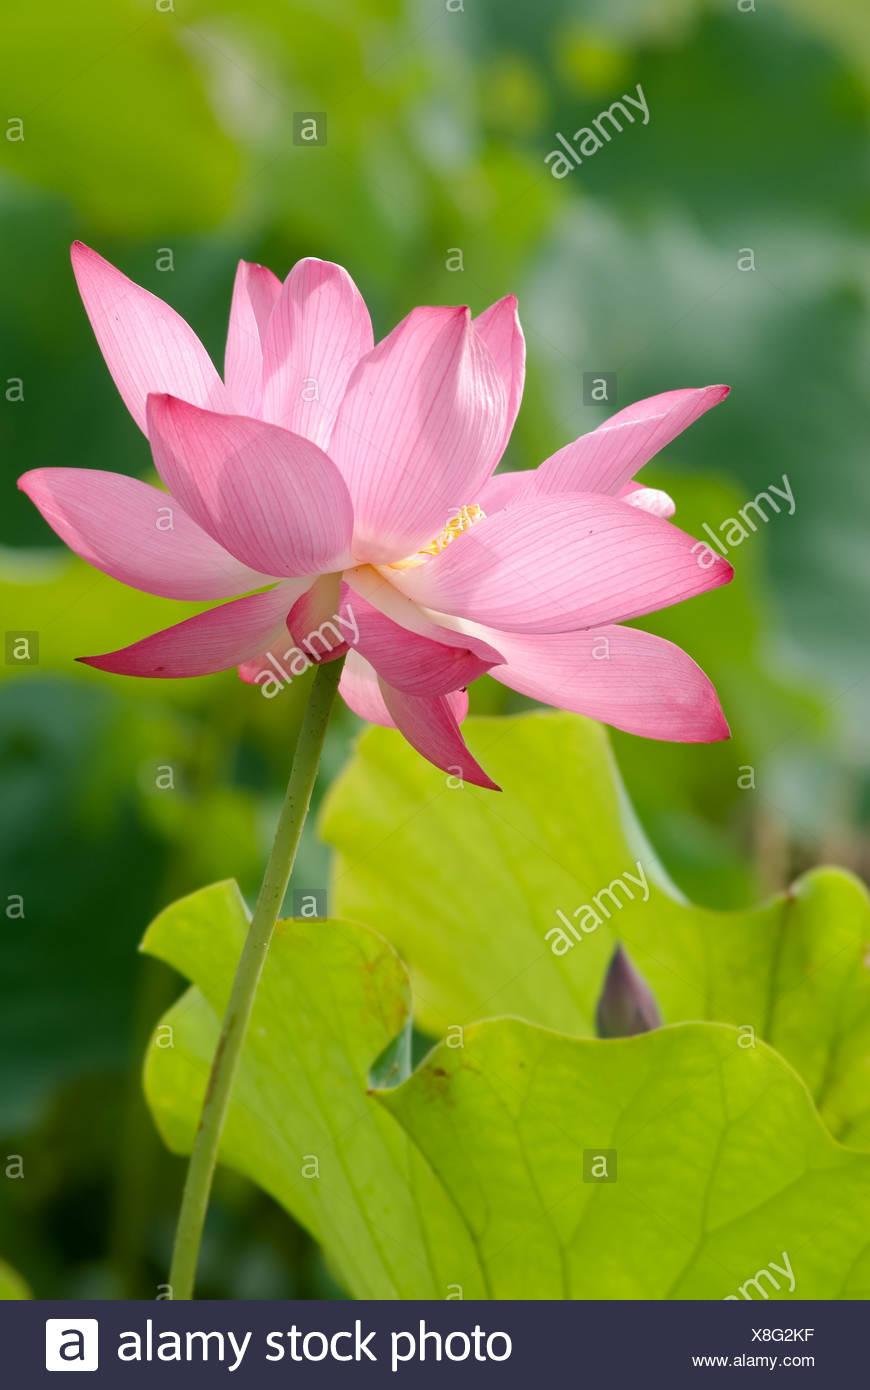 It is the beautiful lotus flower photo stock photo 280636483 alamy it is the beautiful lotus flower photo izmirmasajfo